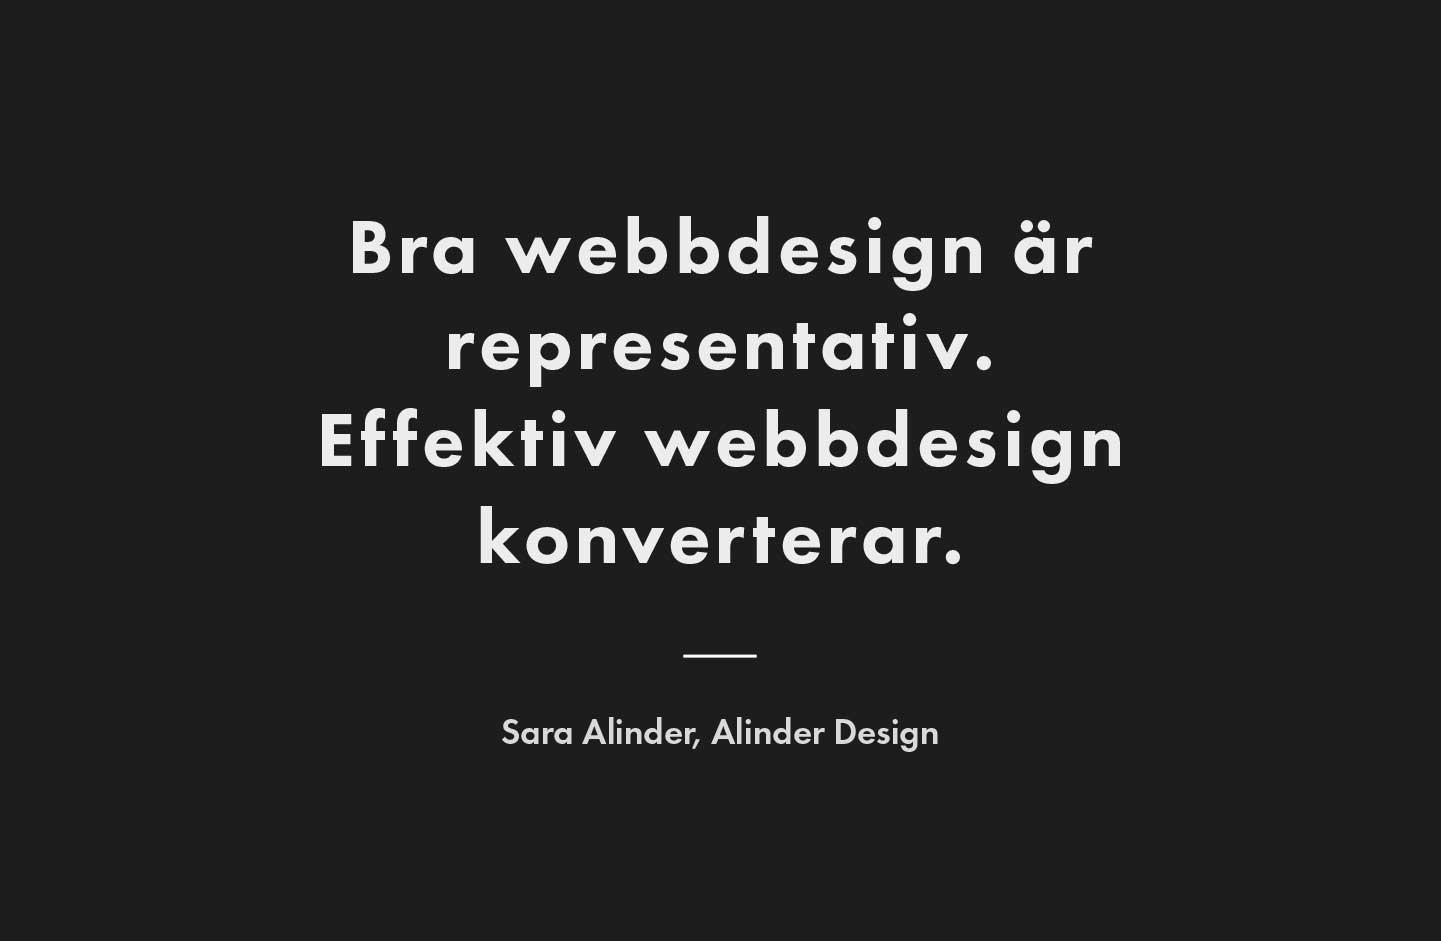 Effektiv webbdesign